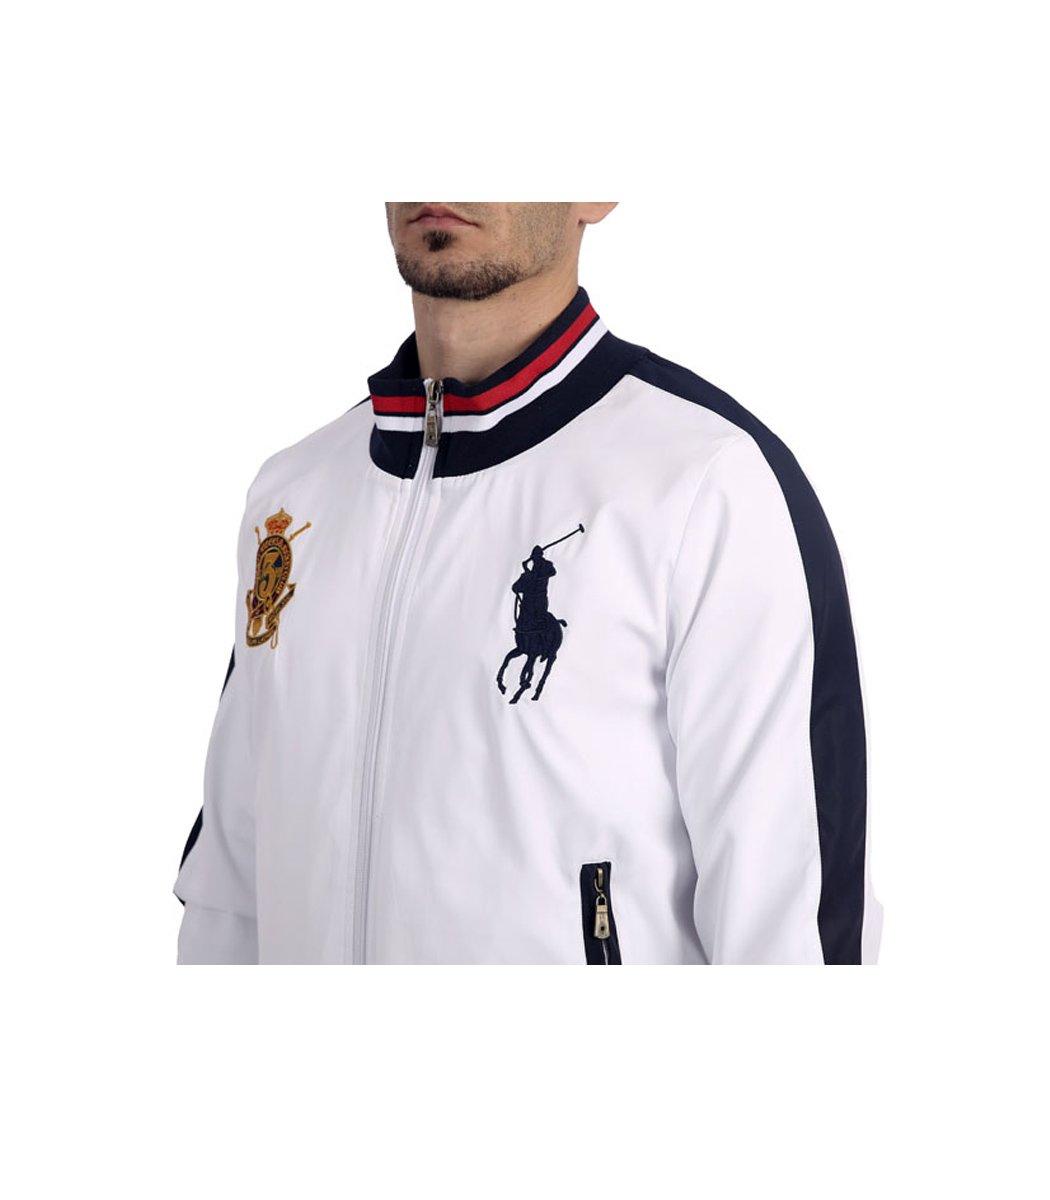 Спортивный костюм POLO Ralph Lauren Classic Белый/темно-синий - Белый - Вид 5